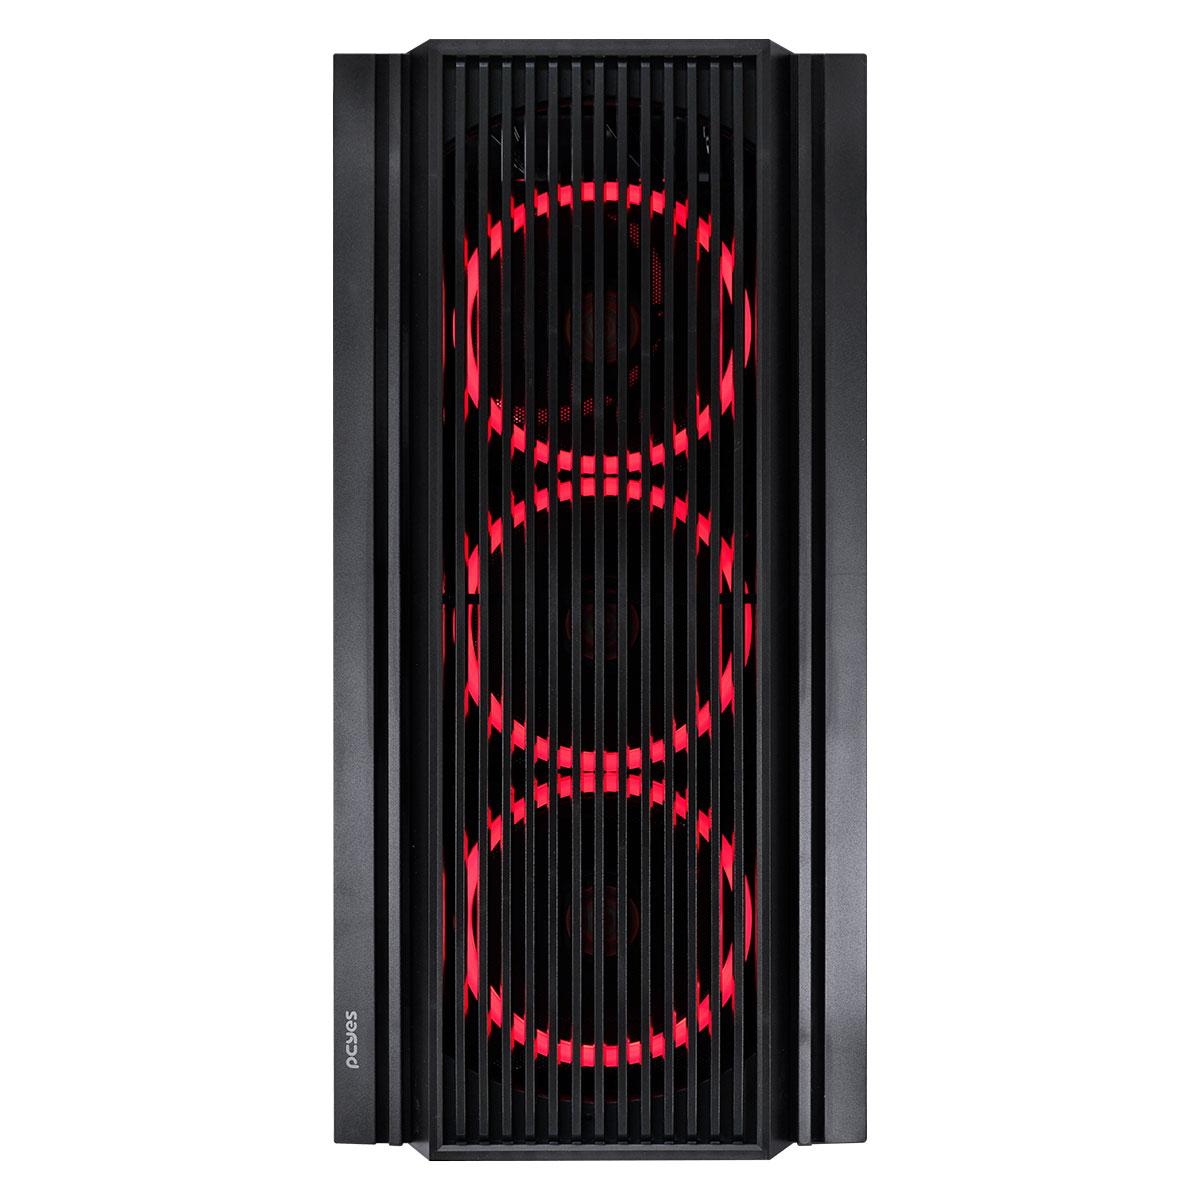 Gabinete Gamer PCYES Atmos, 4x Fans LED Vermelho, Preto - ATPTVM4FCV (33874)